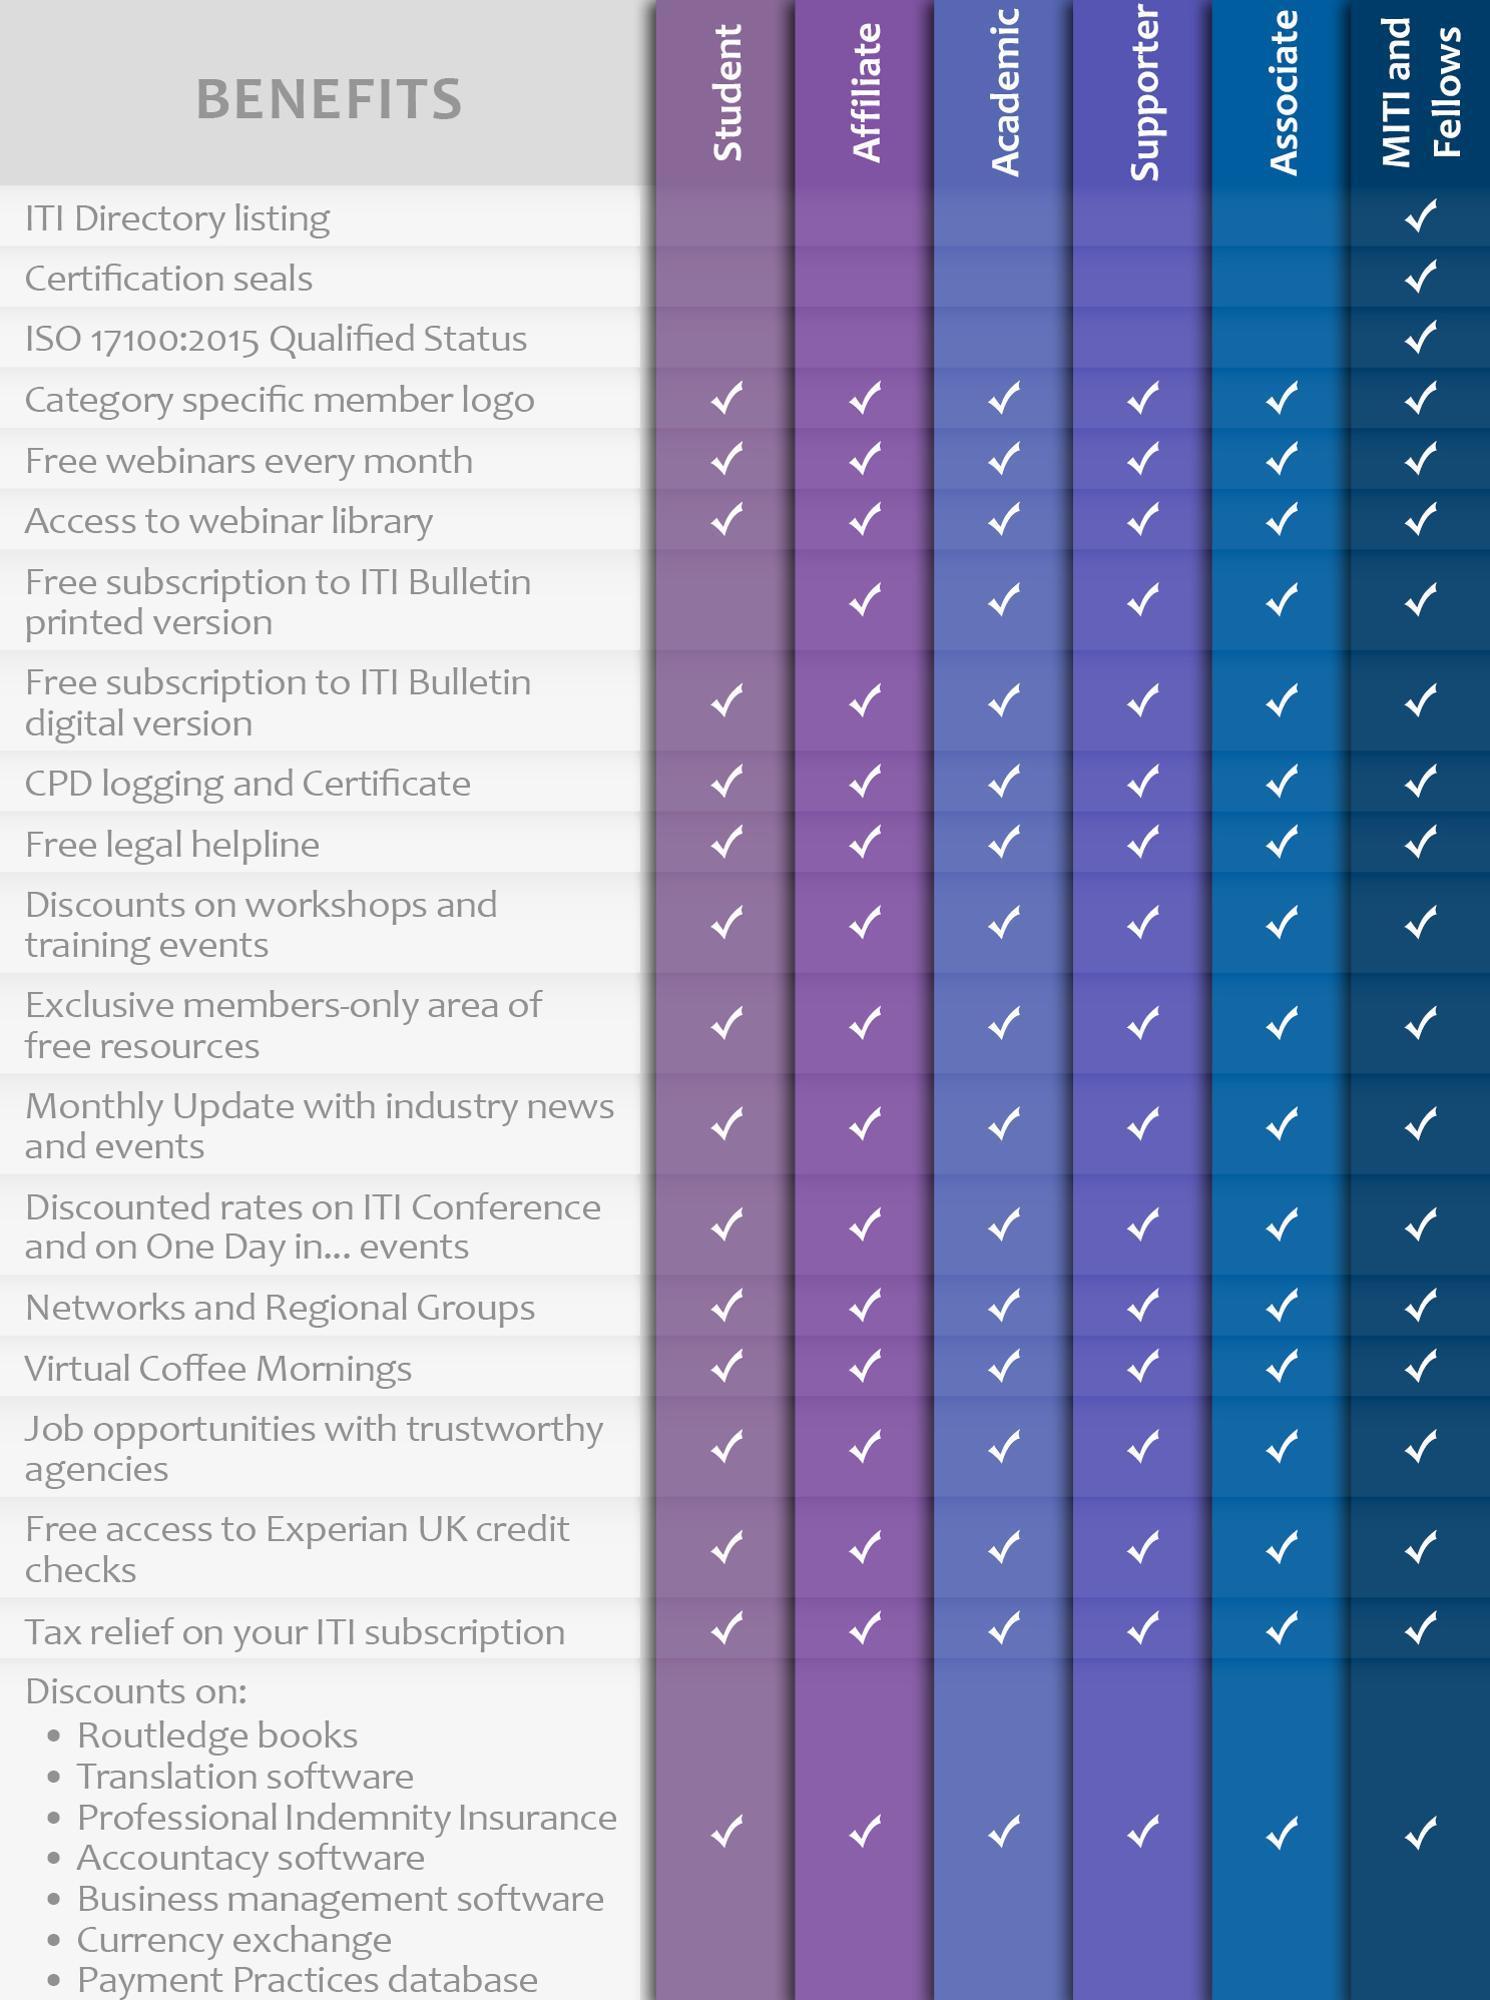 Table showing individual membership benefits